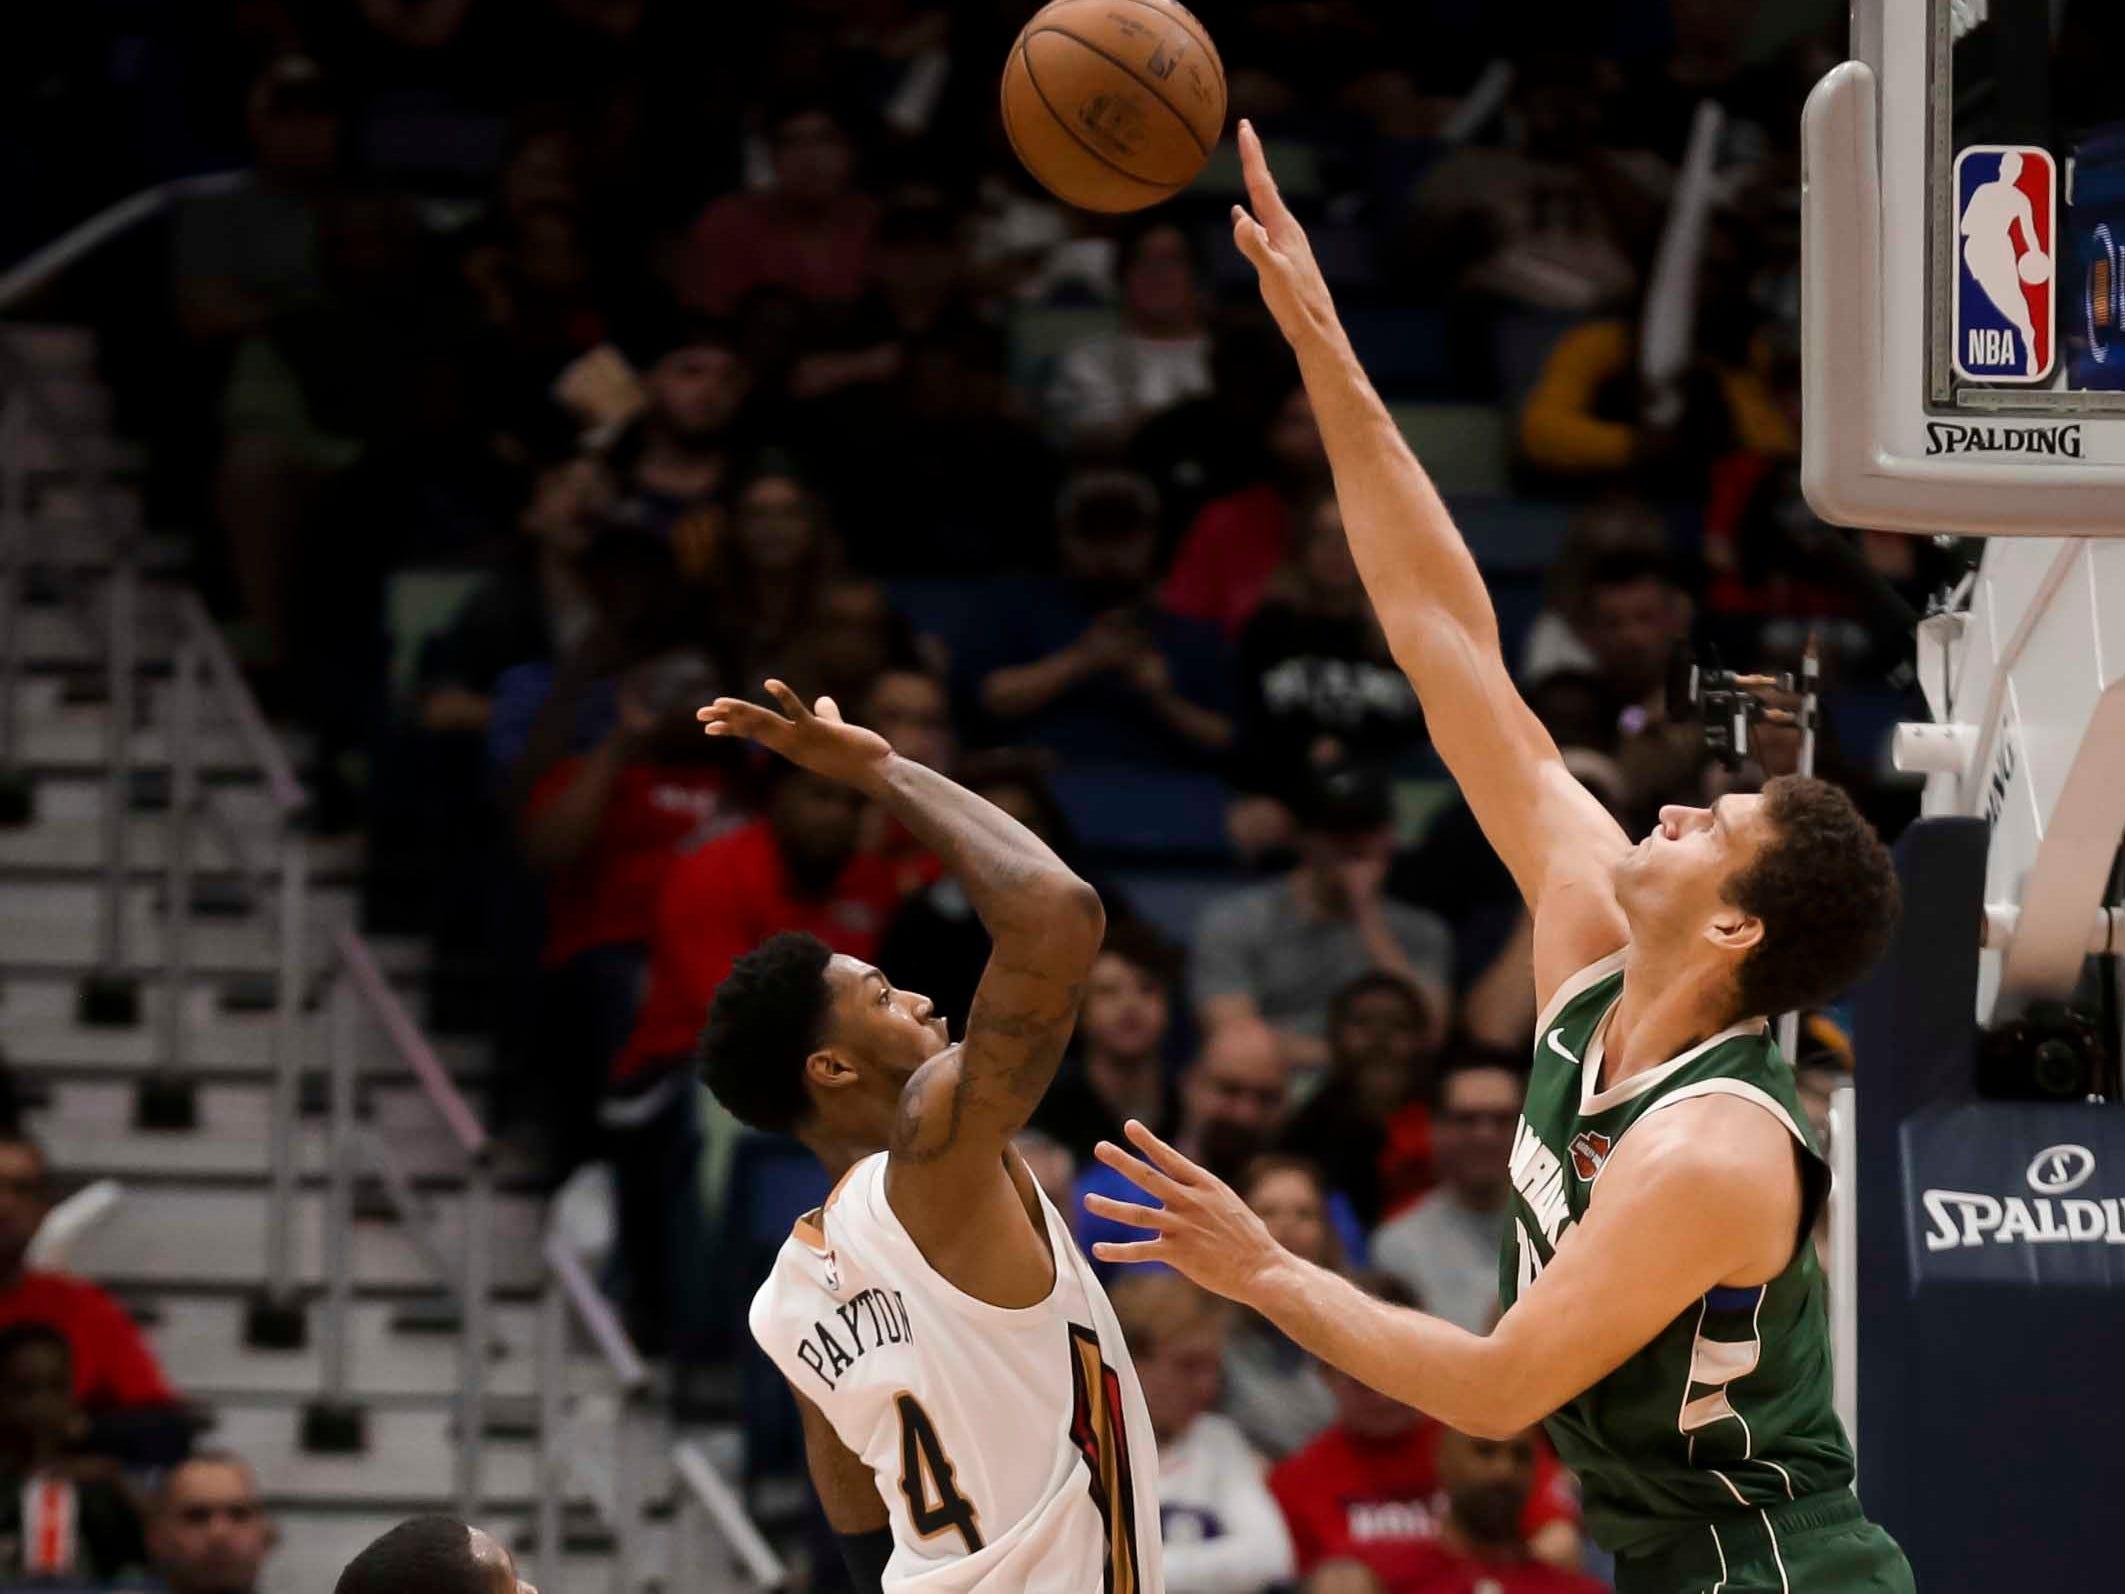 Bucks center Brook Lopez blocks the shot of Pelicans guard Elfrid Payton during the second half.